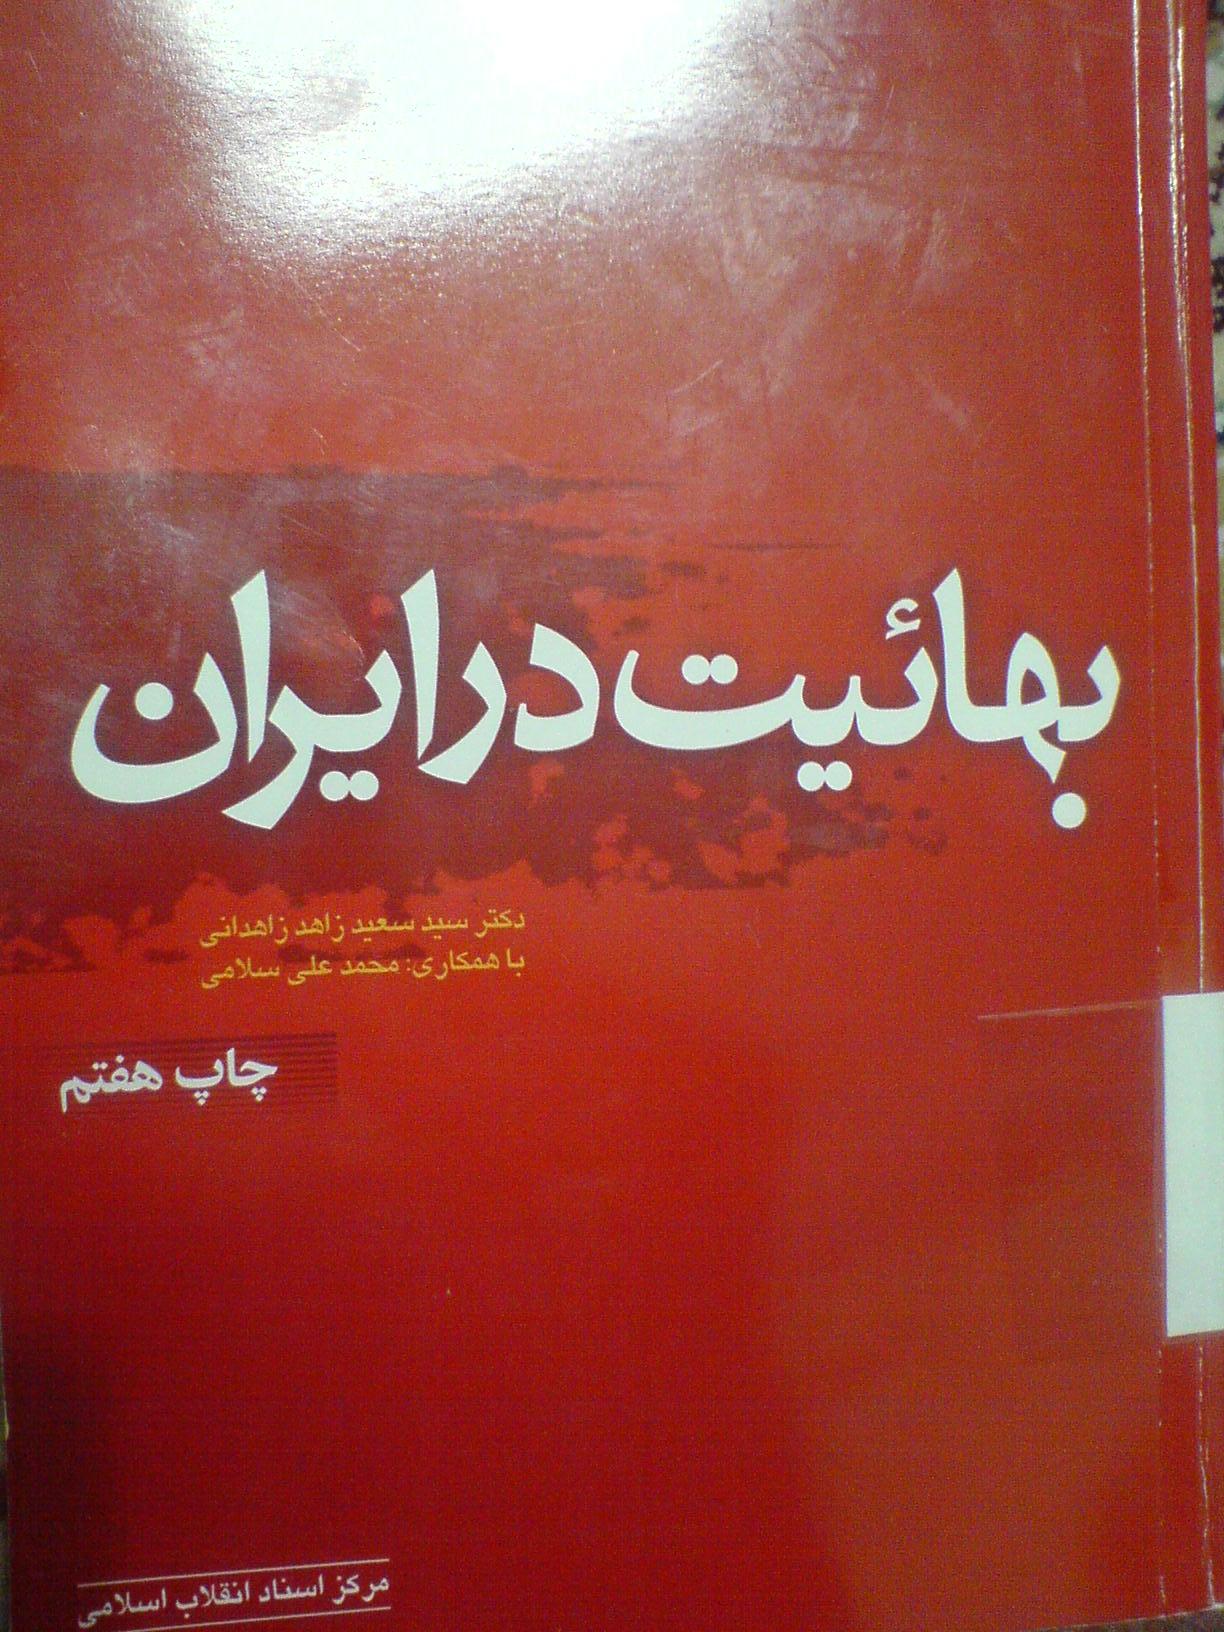 behaiat in iran